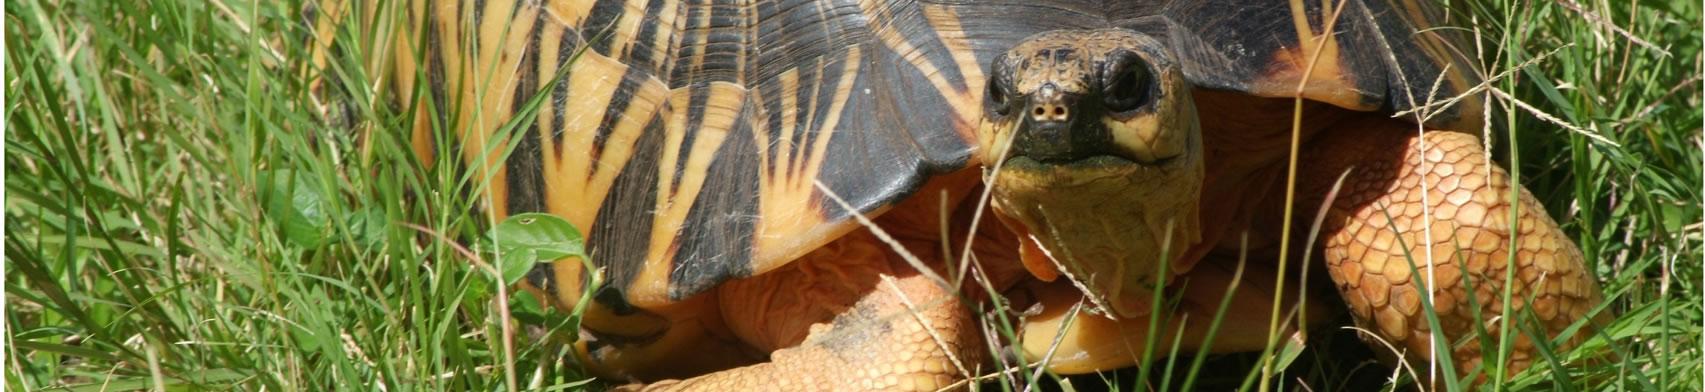 09 giant tortoise